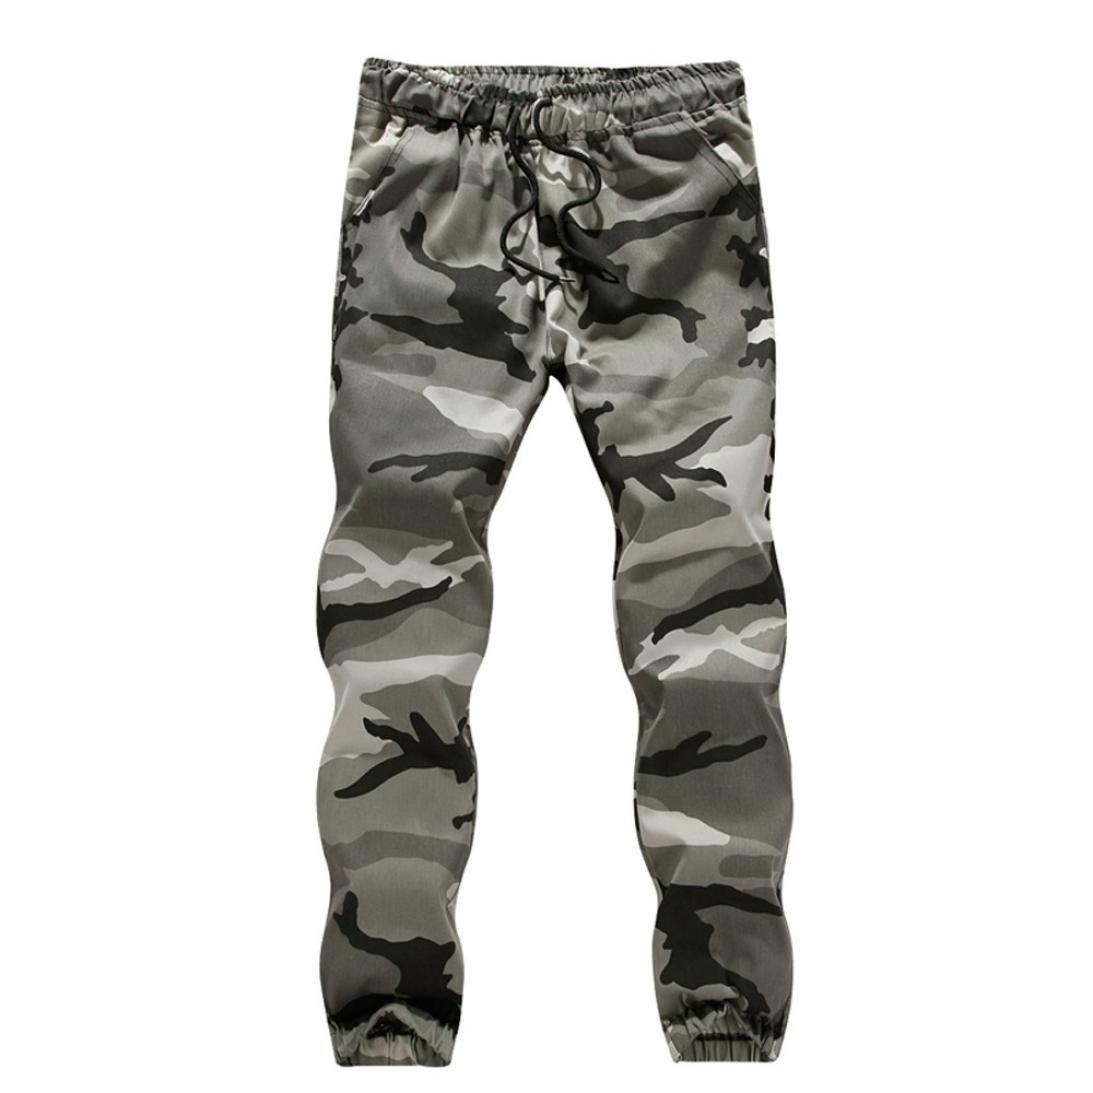 616c1419dbd Men Pants Daoroka Camouflage Plus Size Pockets Elastic Waist Baggy Trousers  Tracksuit at Amazon Men s Clothing store